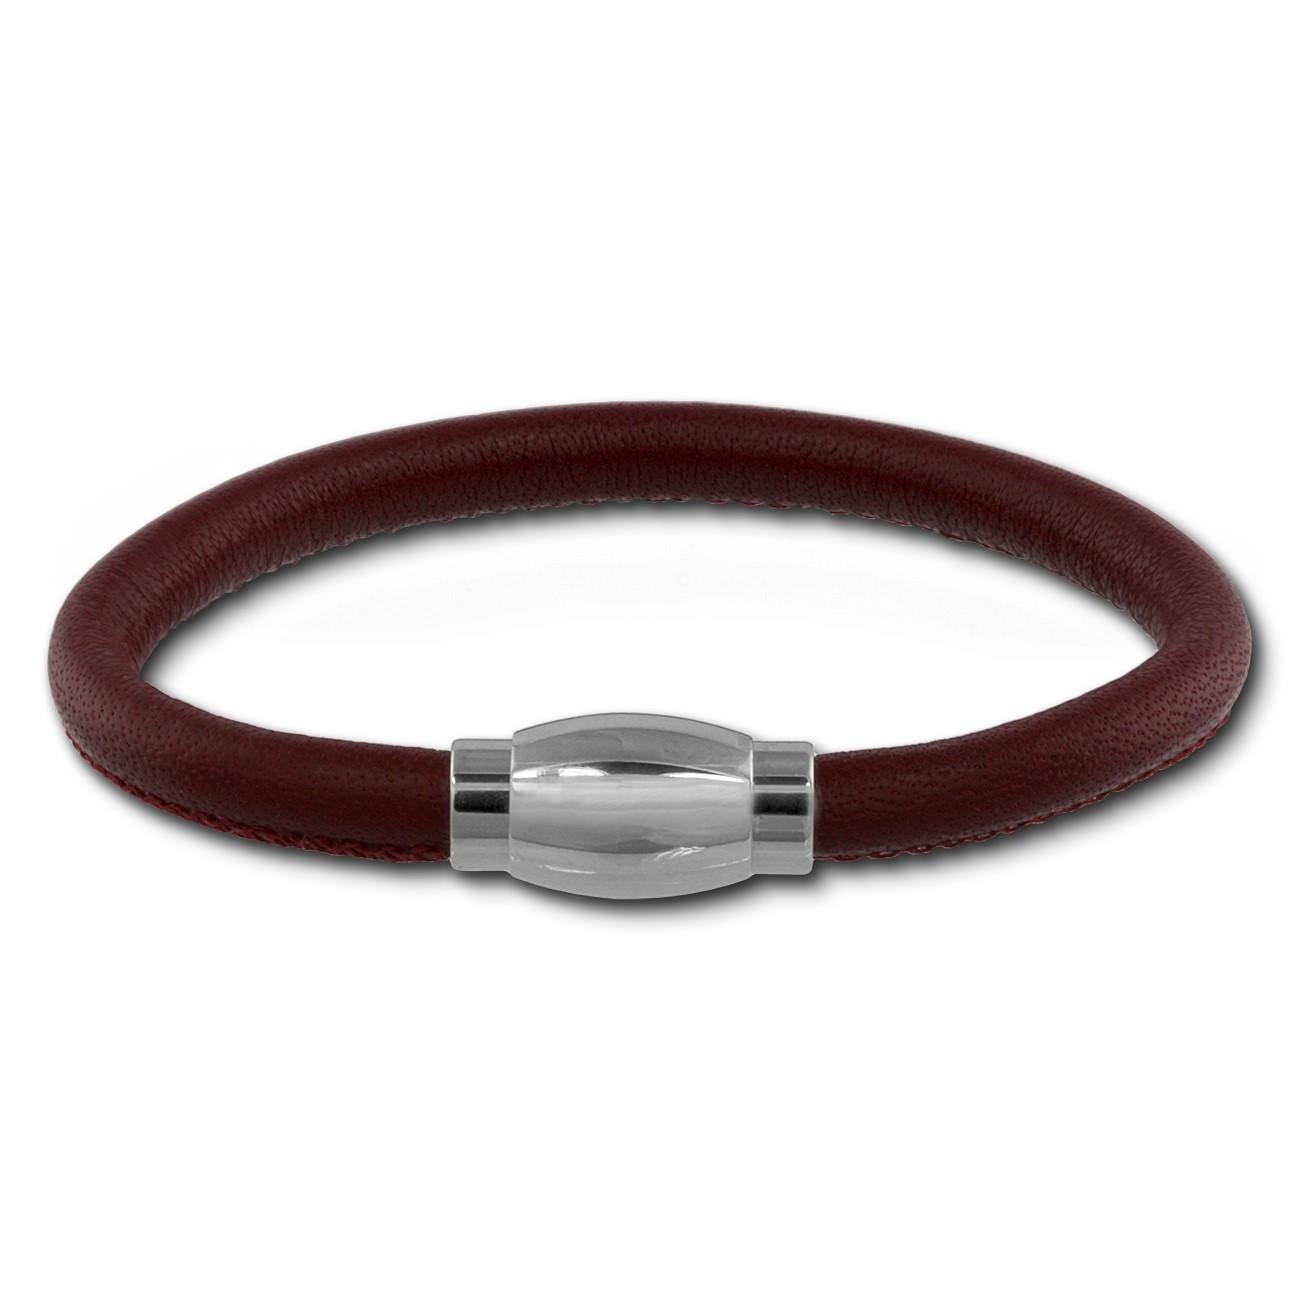 SilberDream Nappa Leder Armband rot 20cm Edelstahlverschluss LAB0920